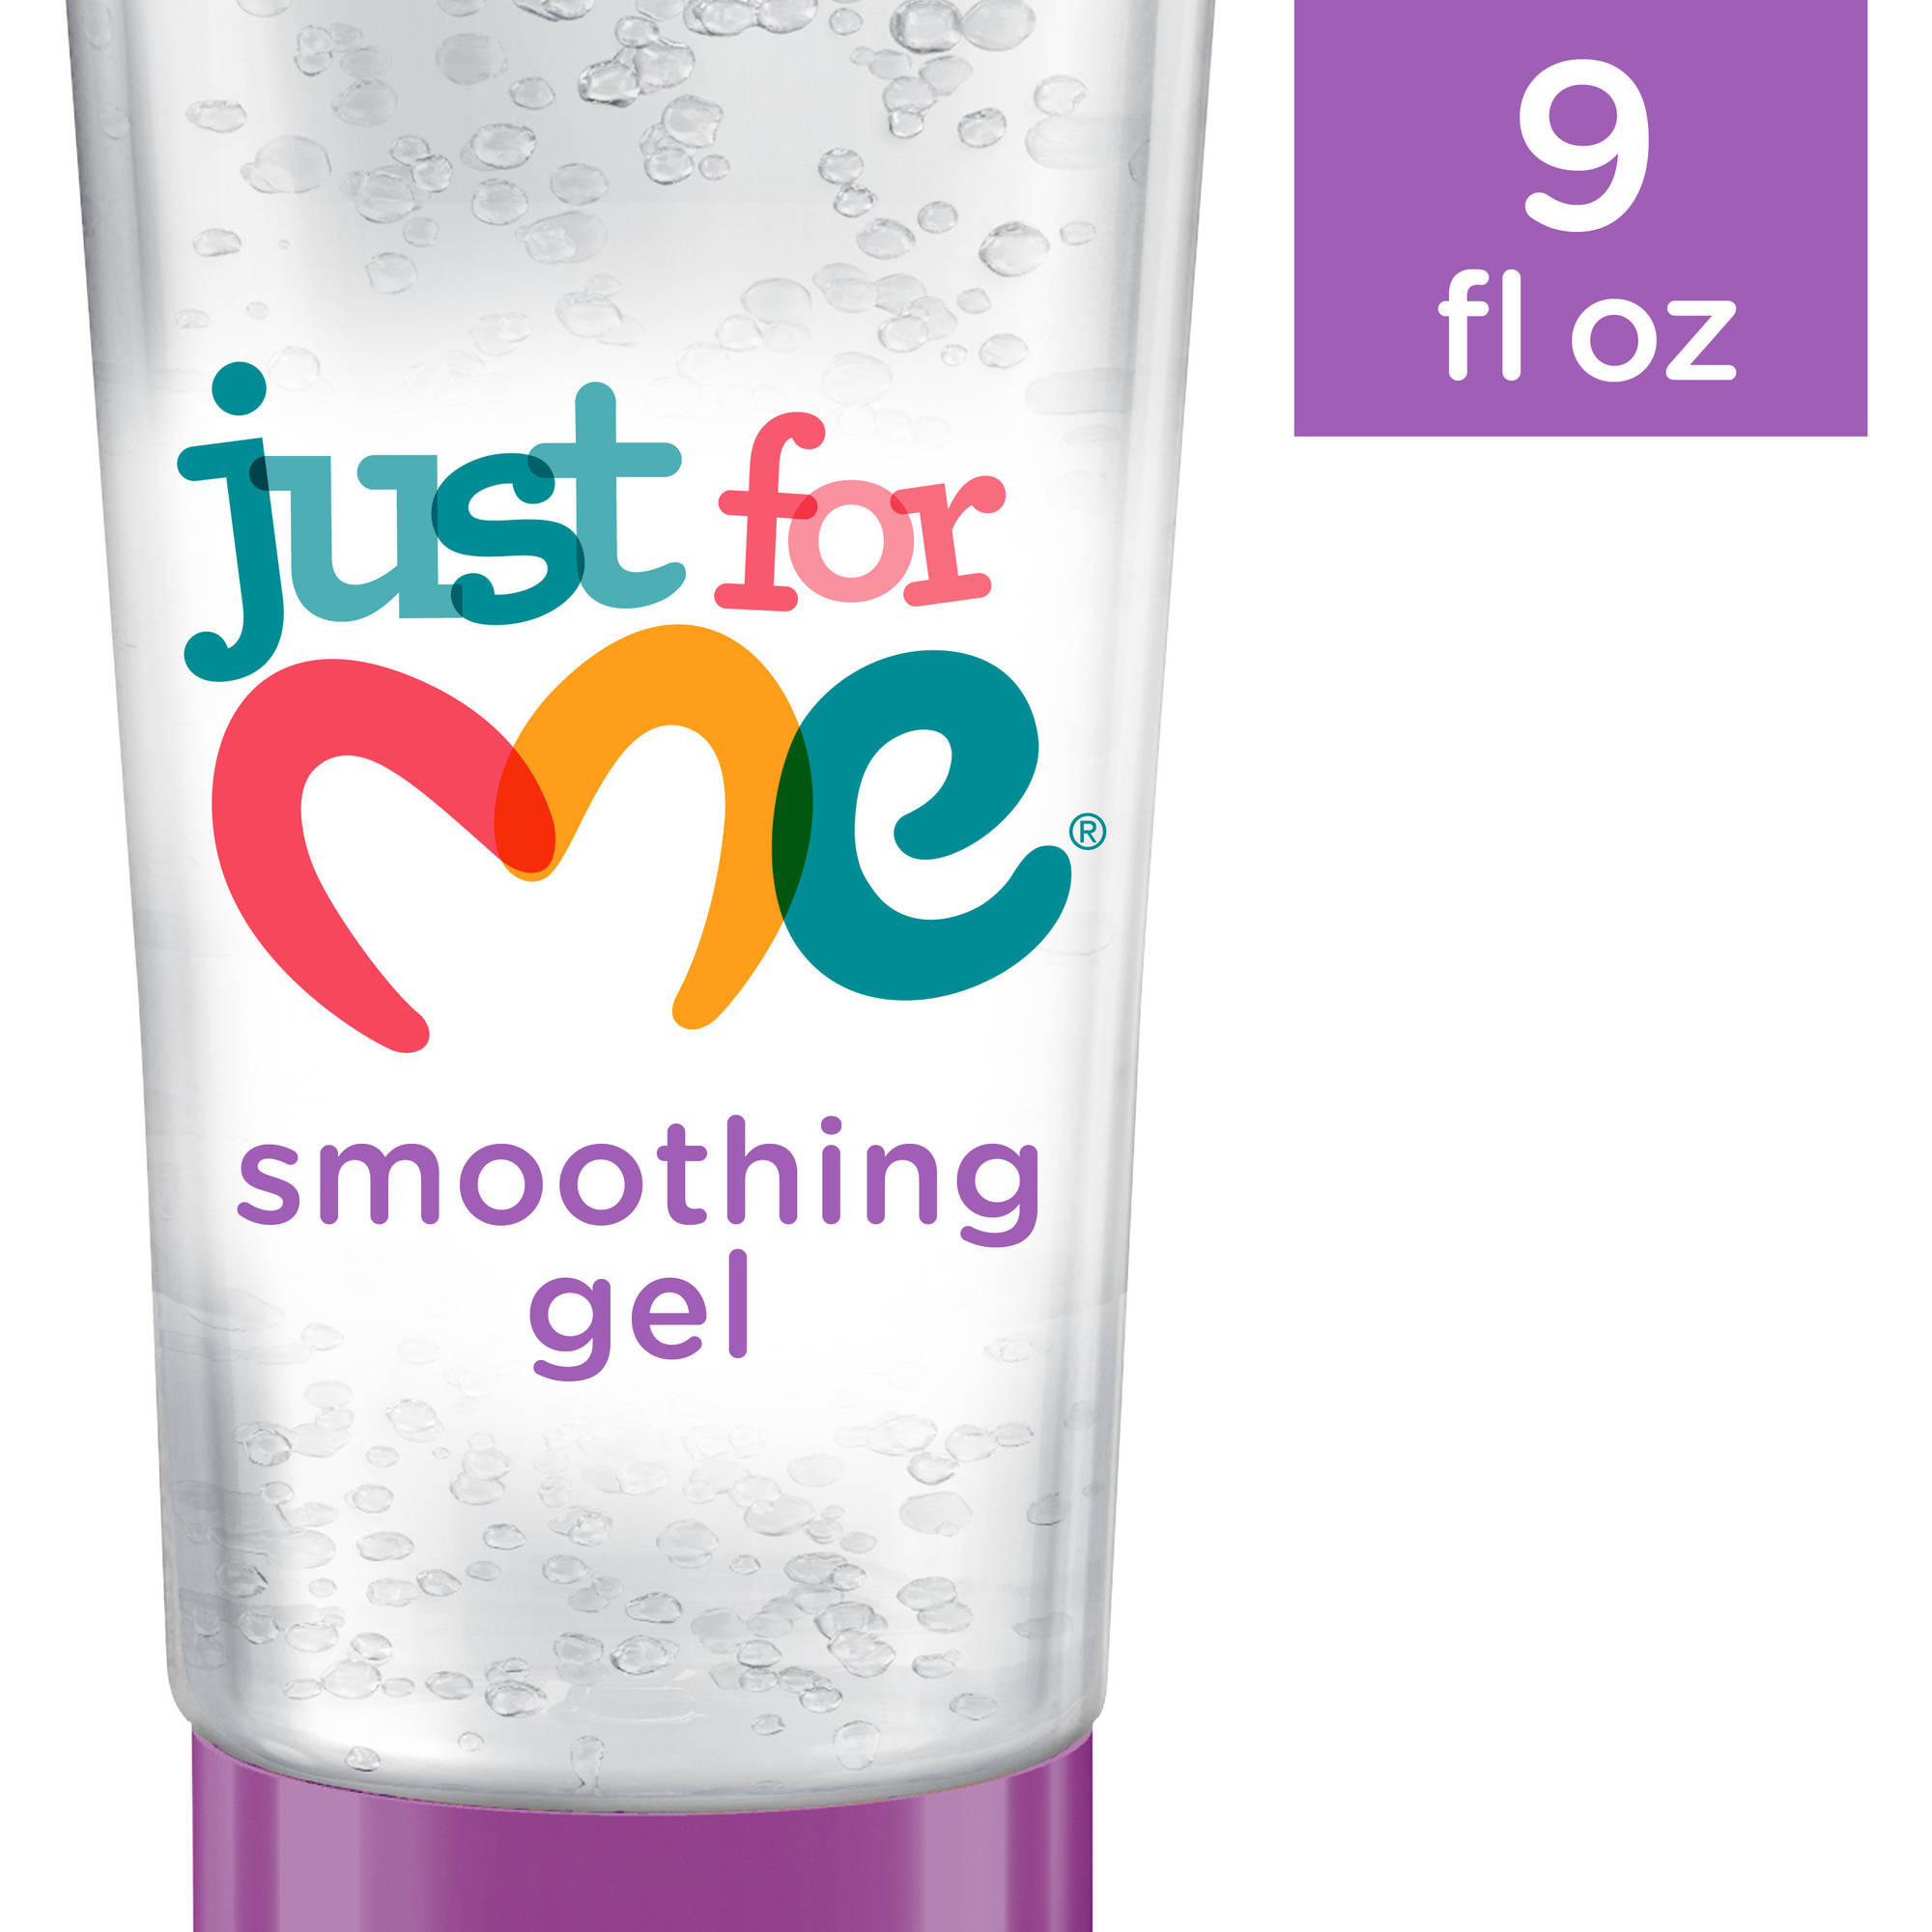 Just For Me Smoothing Gel Hair Styler, 9 oz